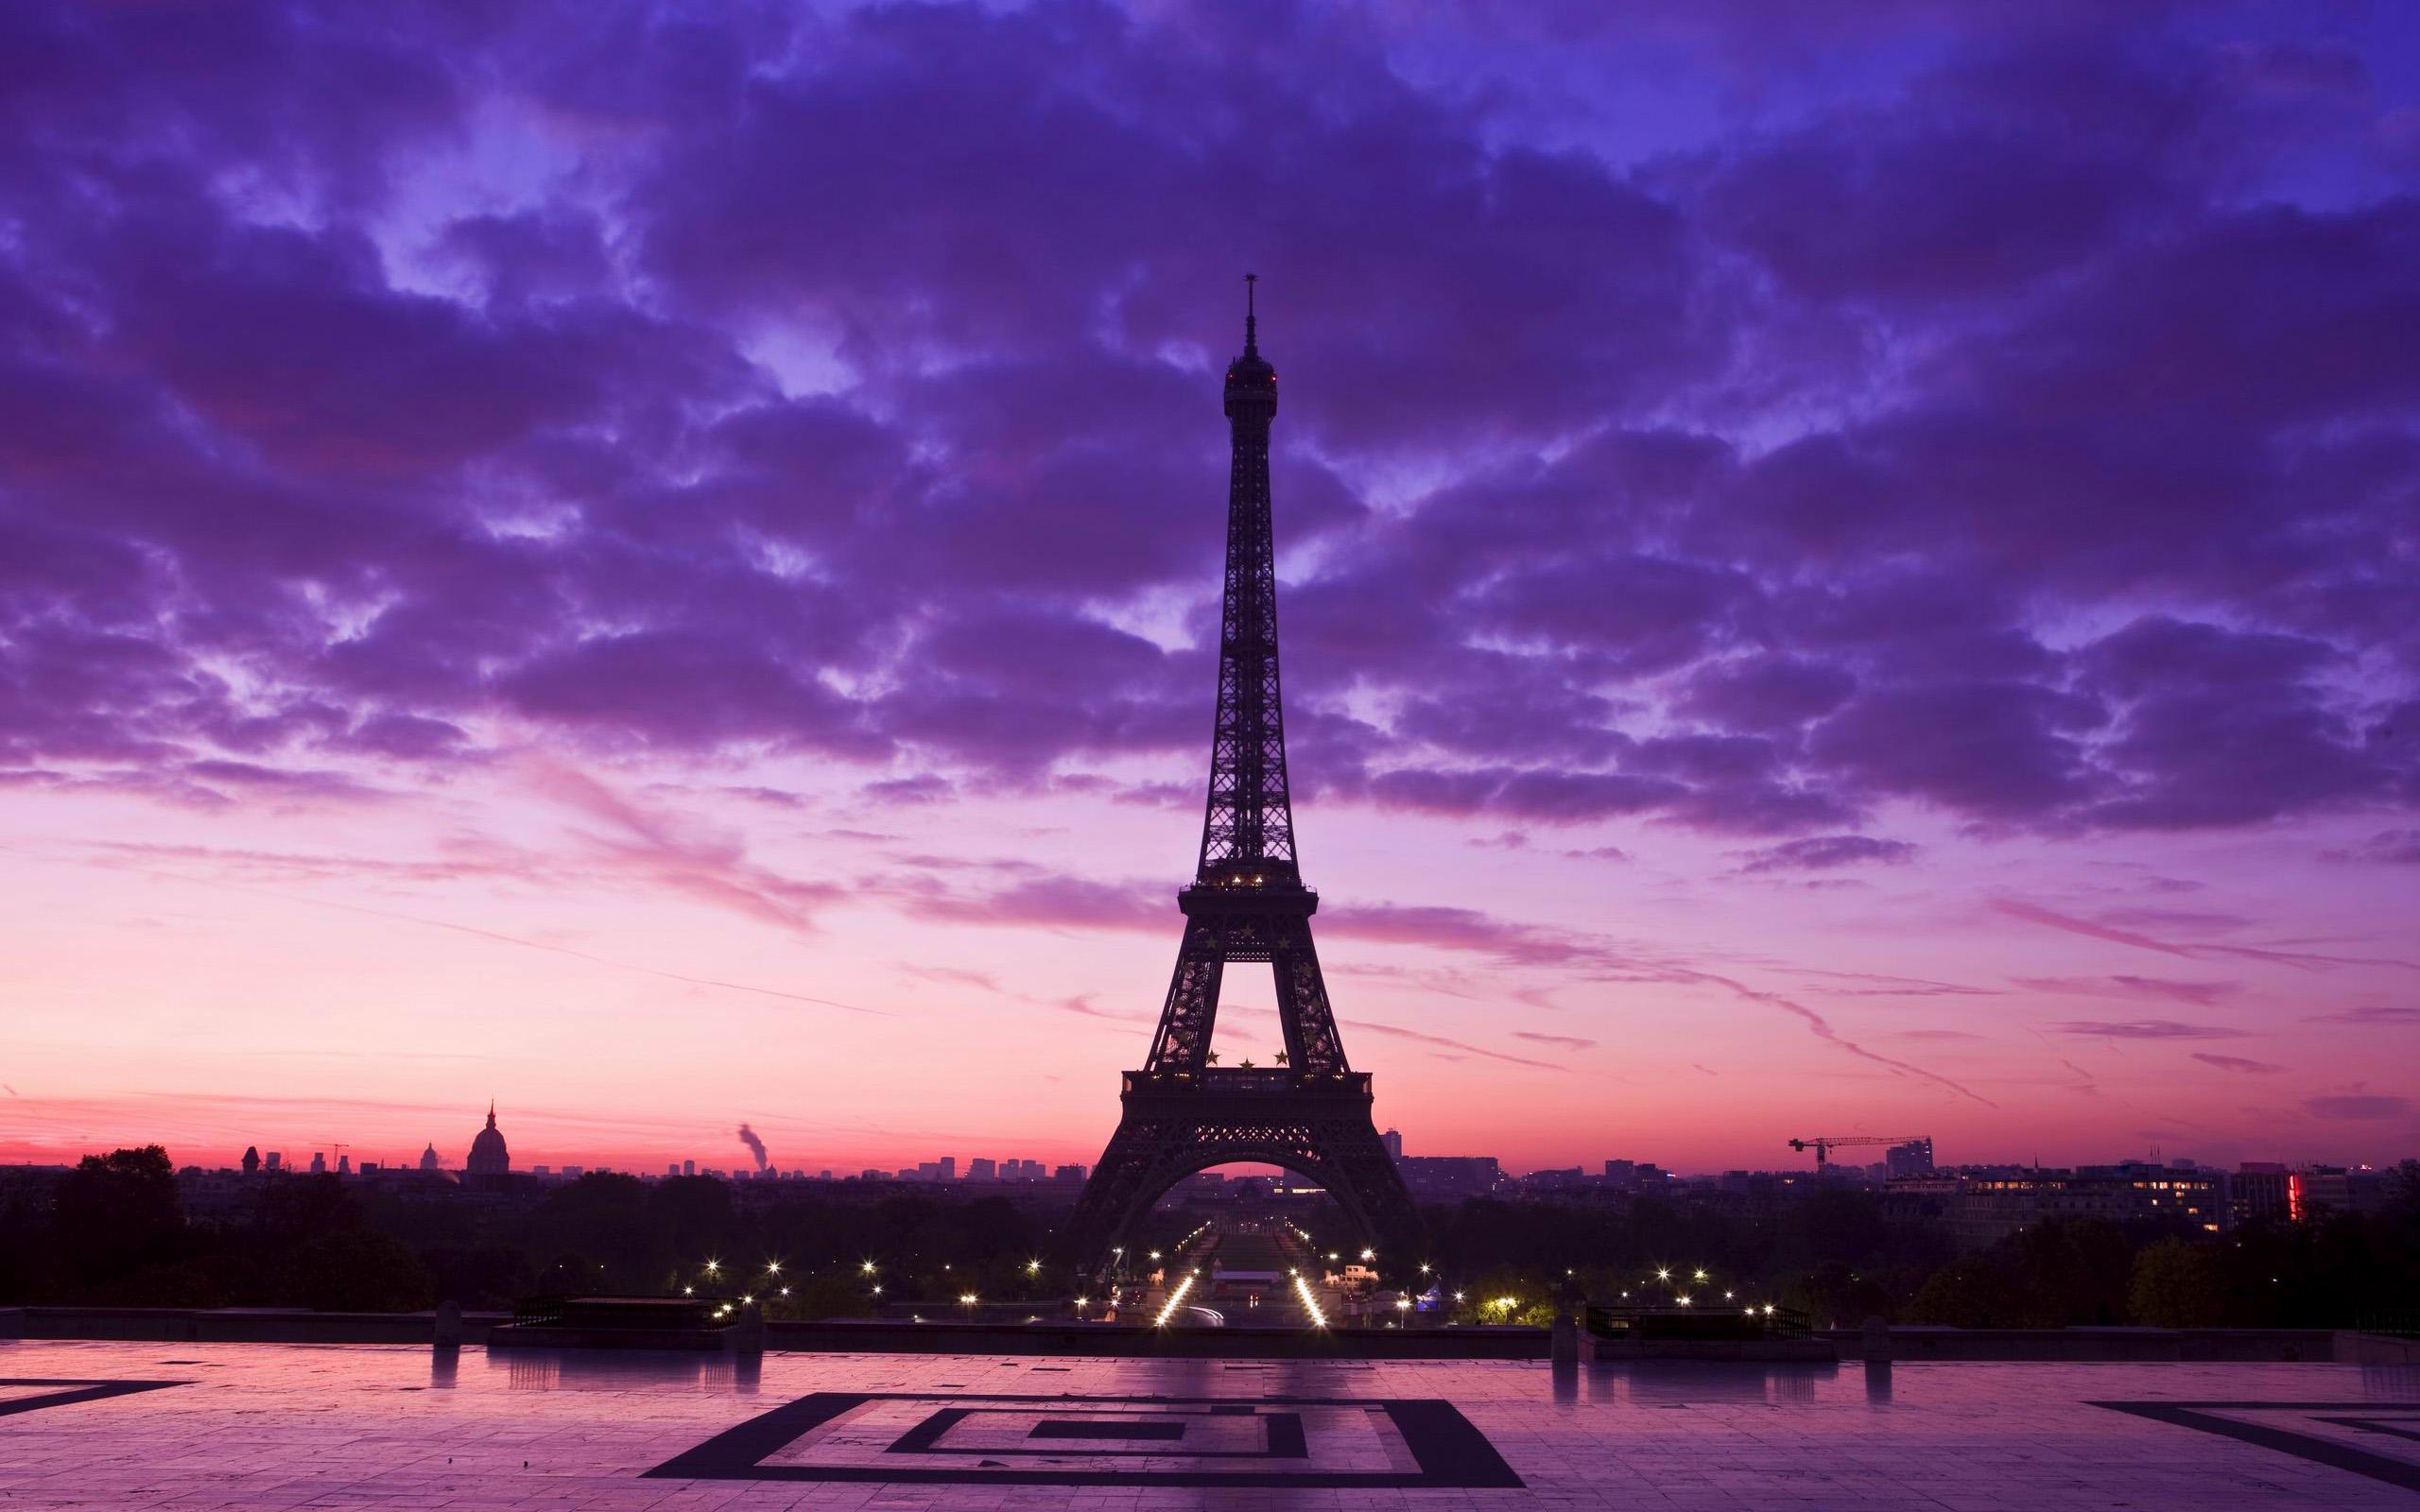 paris wallpapers 15 2560x1600